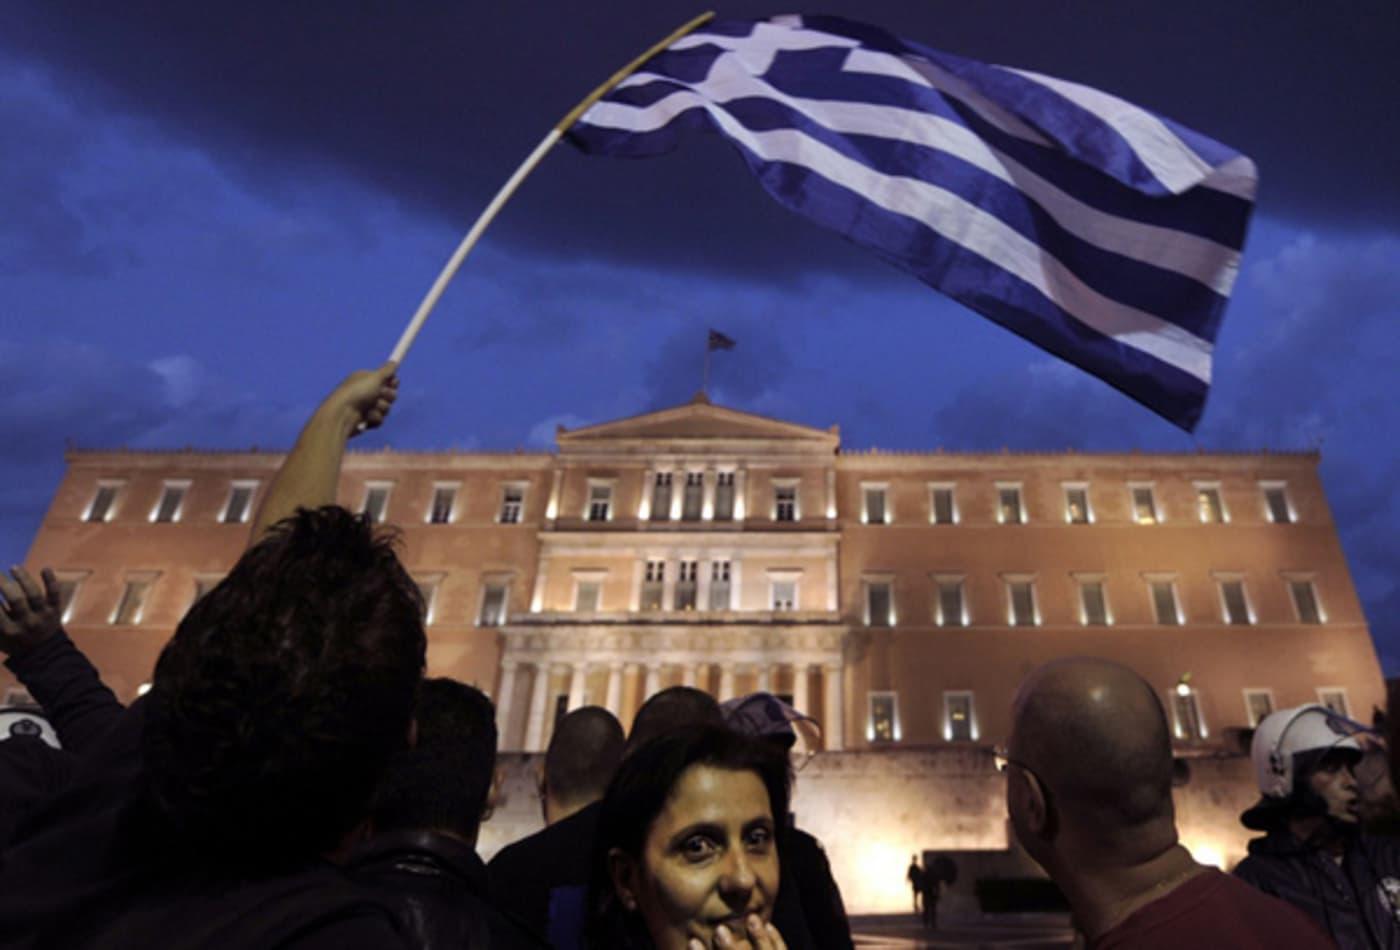 CNBC_Major_Events_Eurozone_Greek_Parliament,jpg.jpg